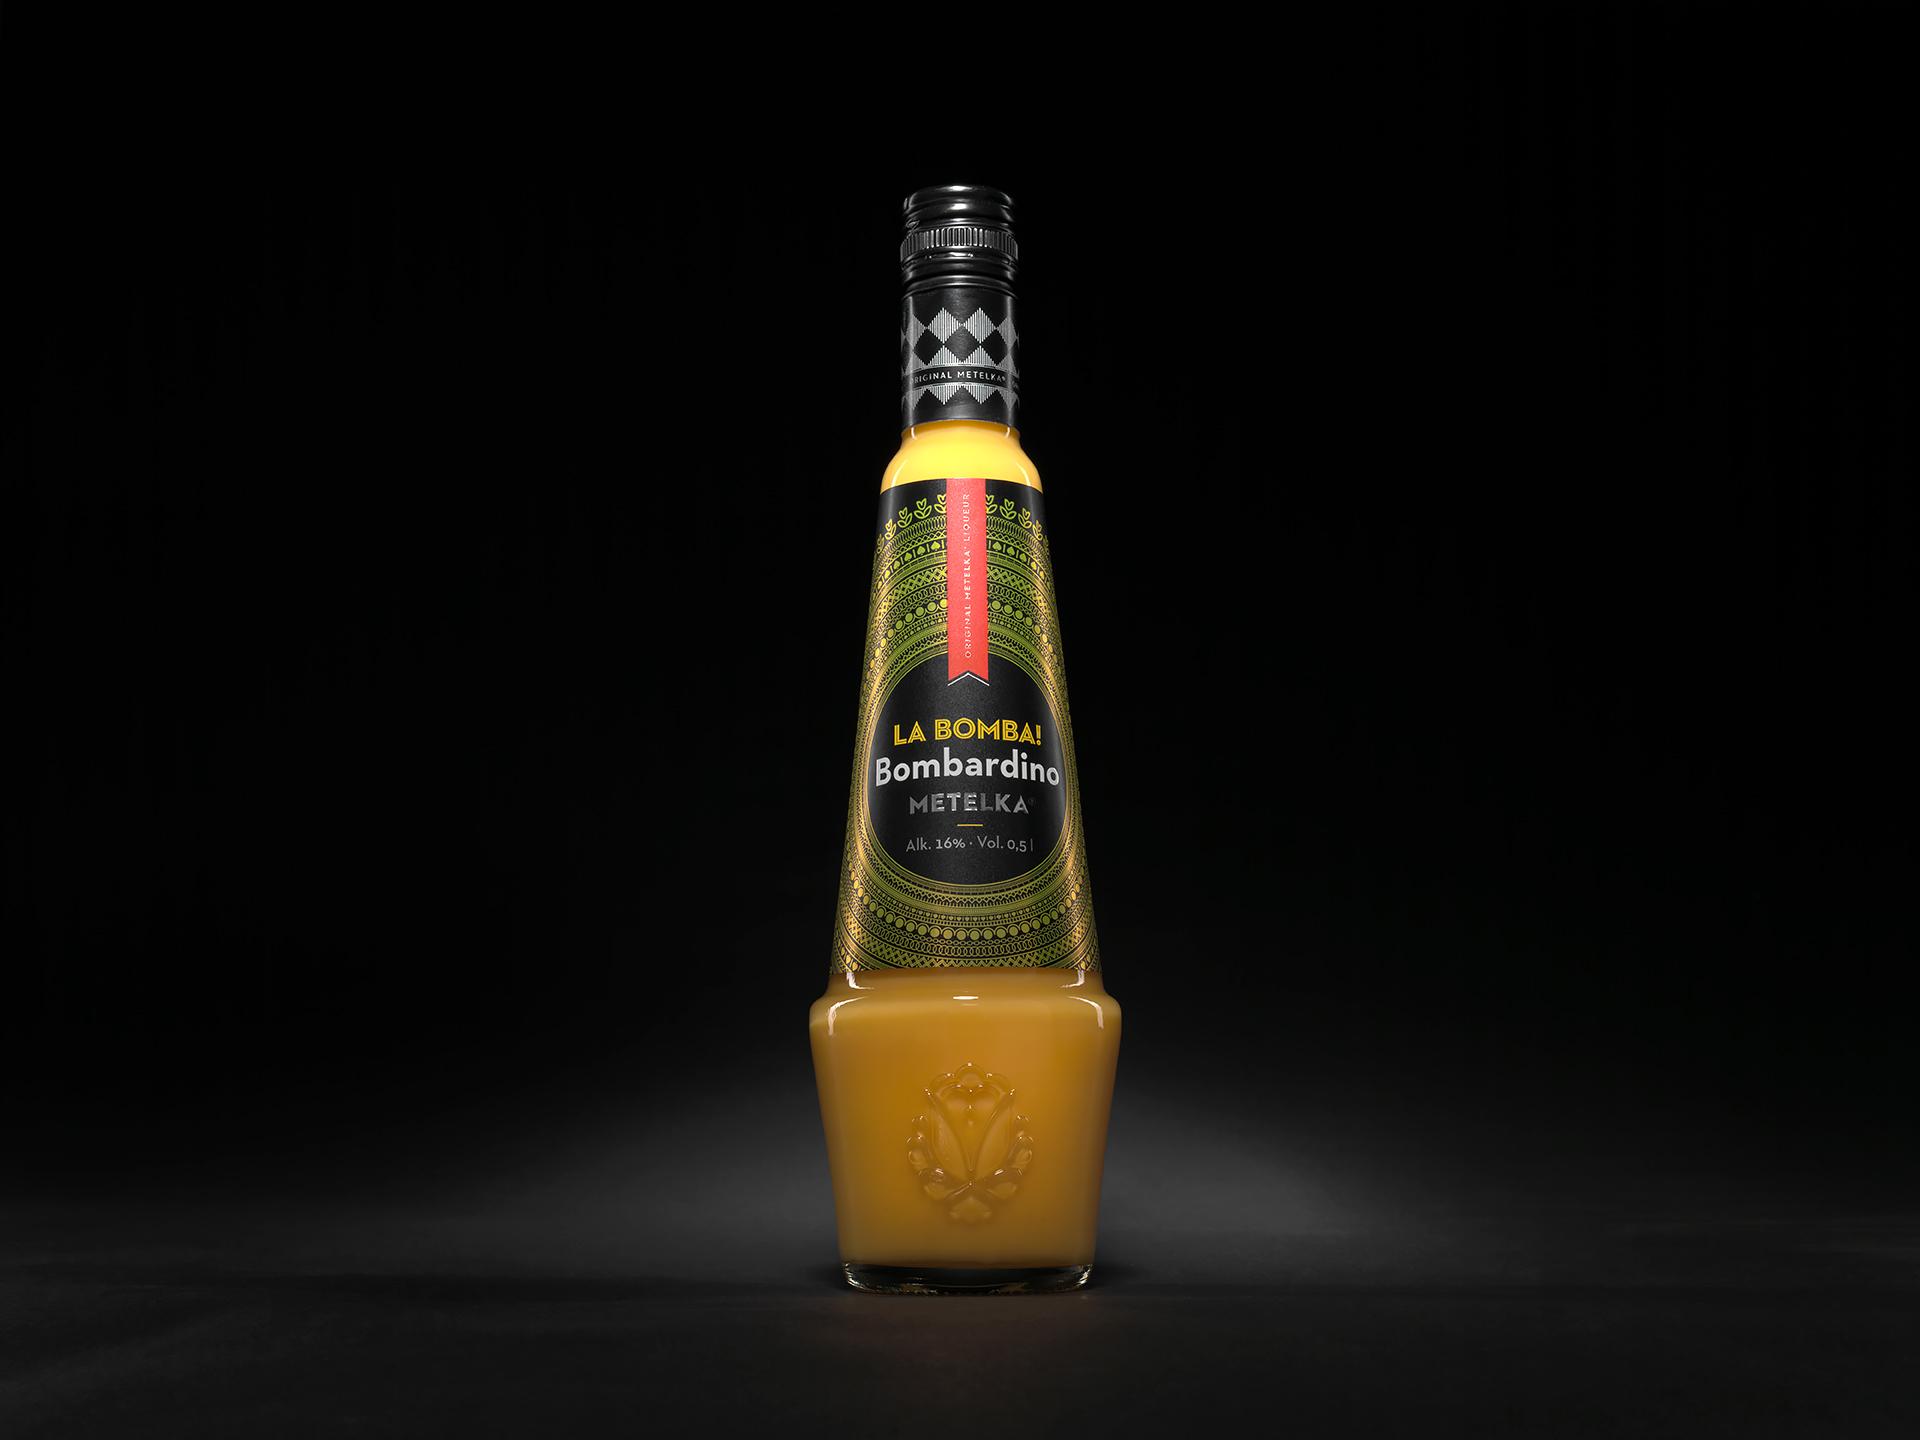 Bombardino italský vaječný likér